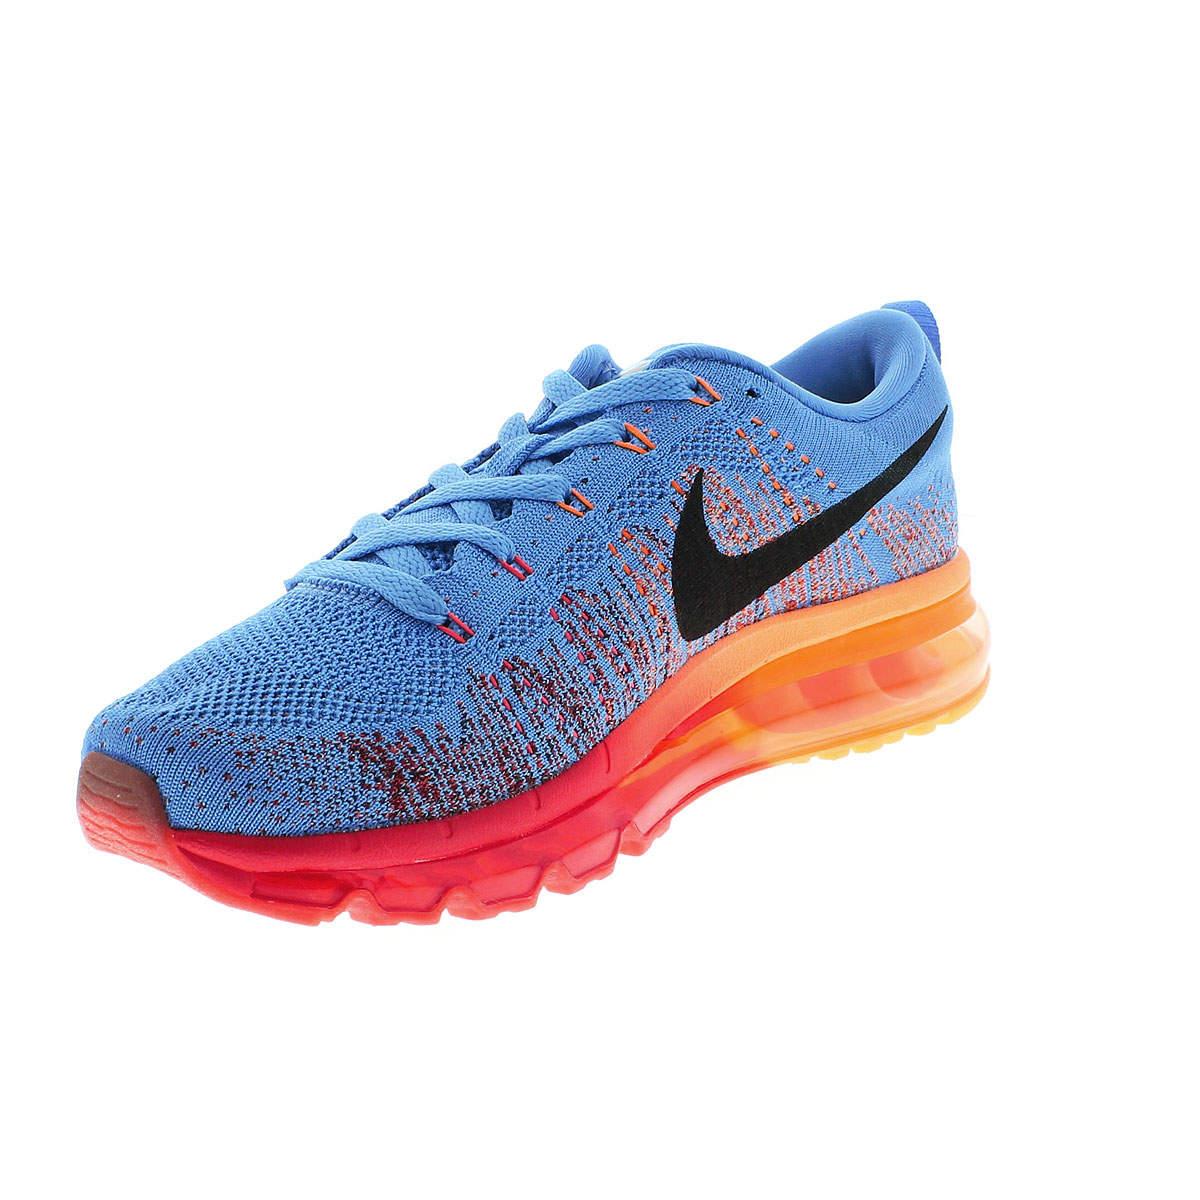 Nike Flyknit Air Max - Azul com Laranja e Vermelho  - ACKIMPORTS